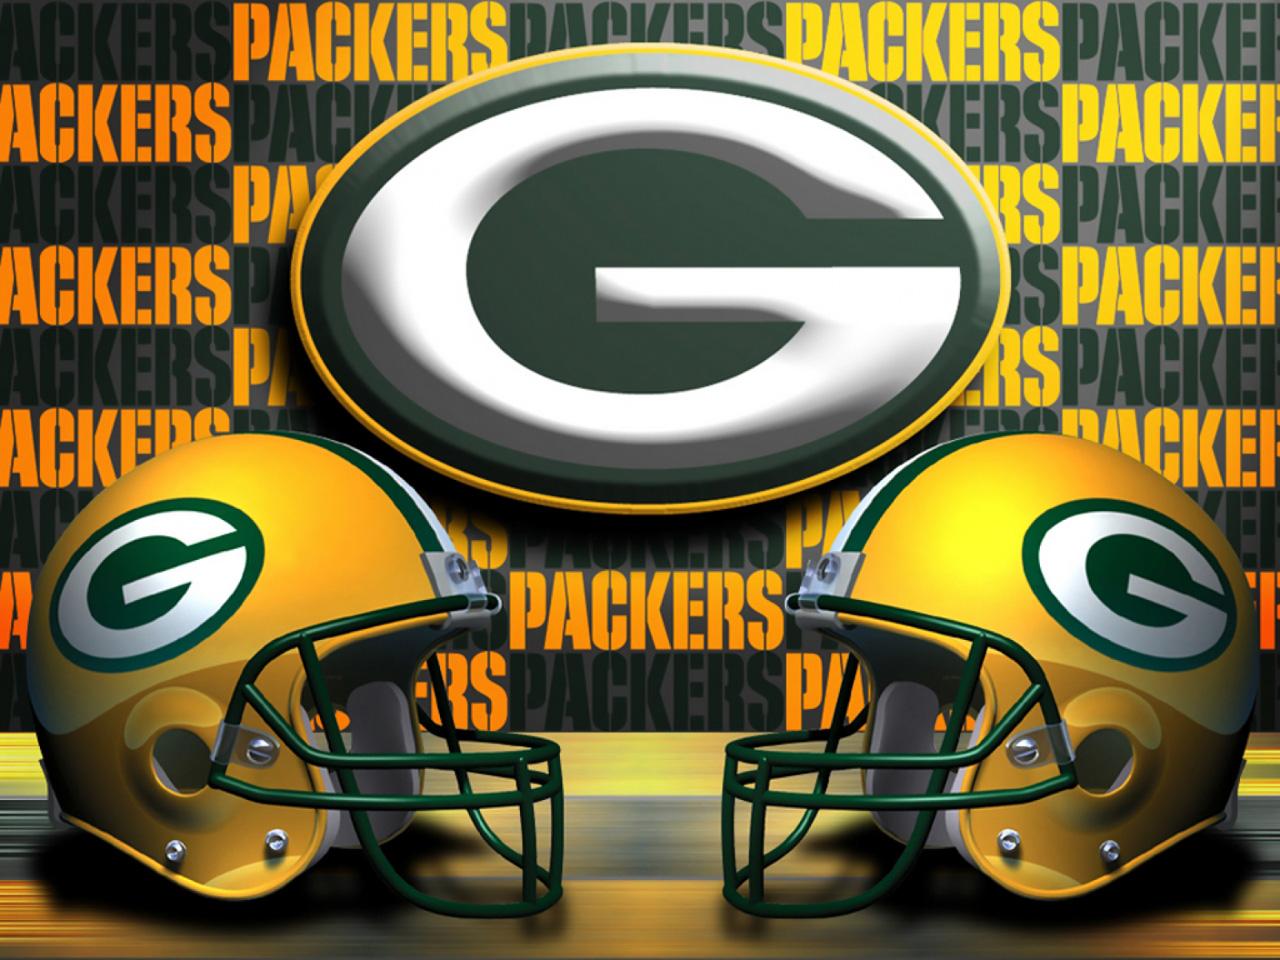 Packers wallpaper desktop wallpapers Green Bay Packers wallpapers 1280x960